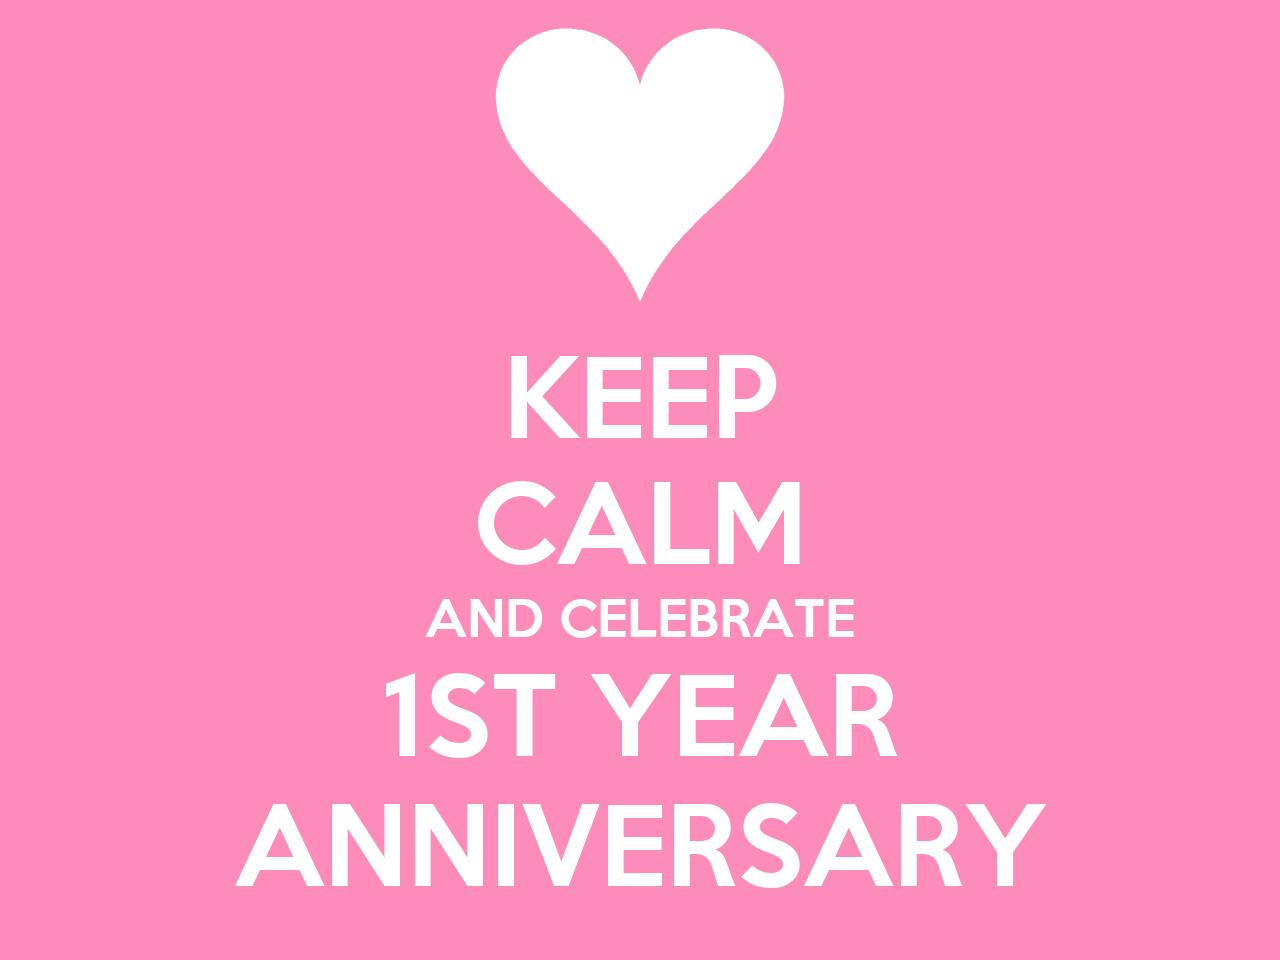 celebrate anniversary this month